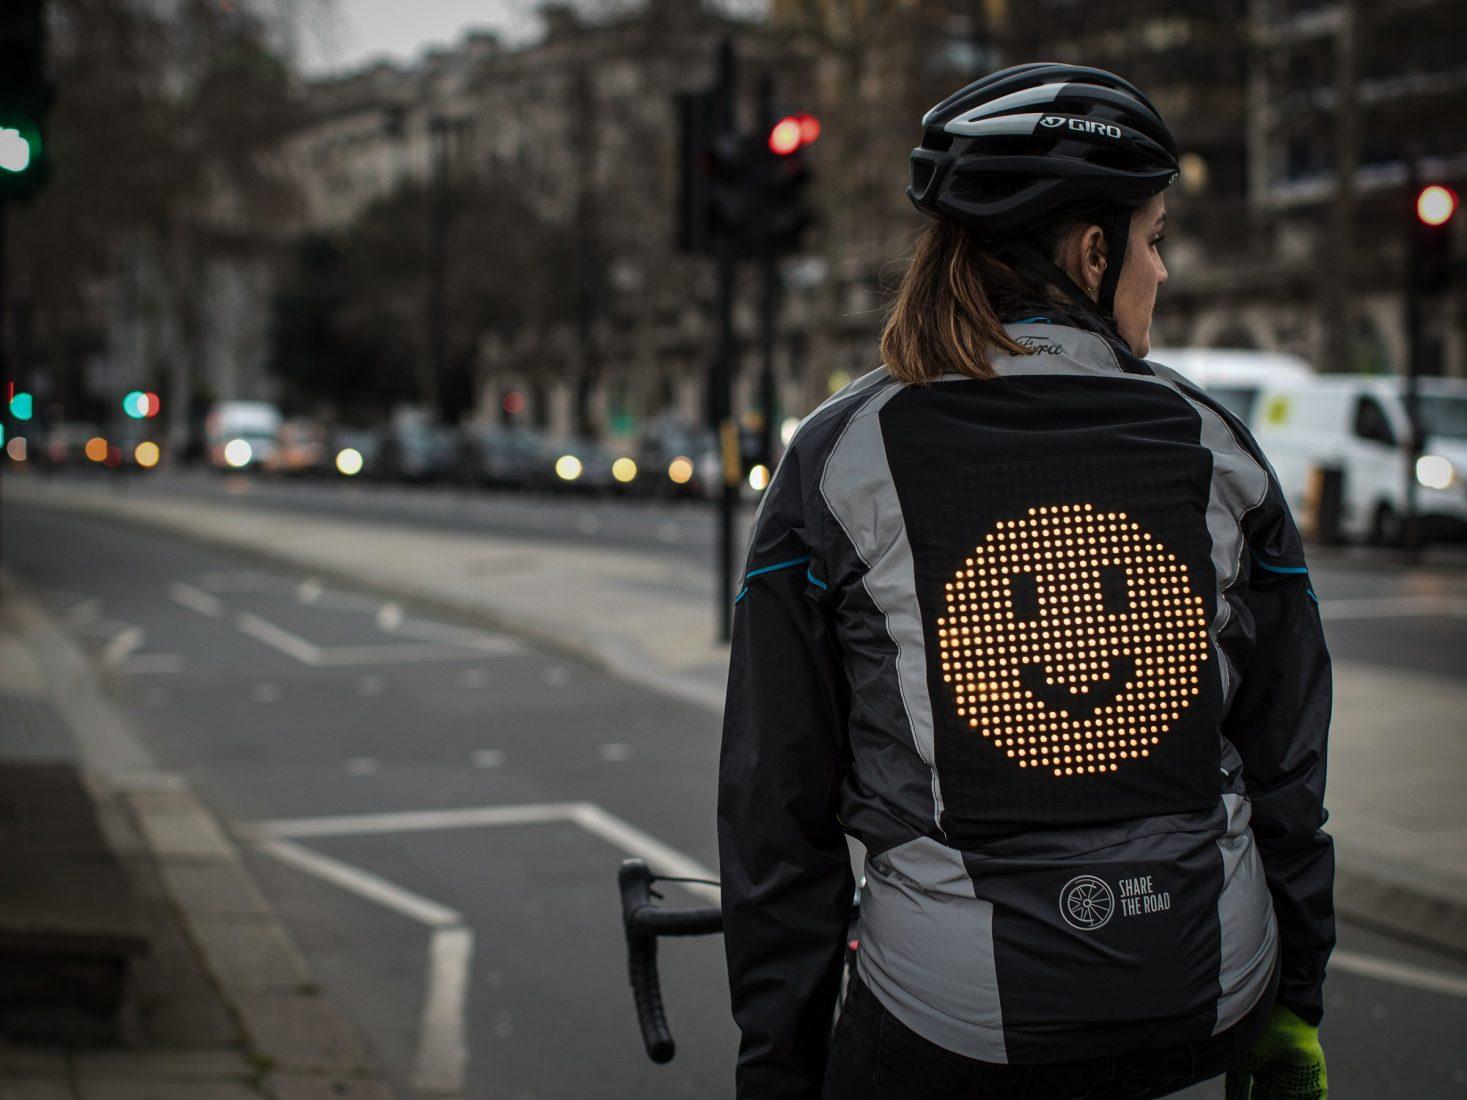 La giacca emoji